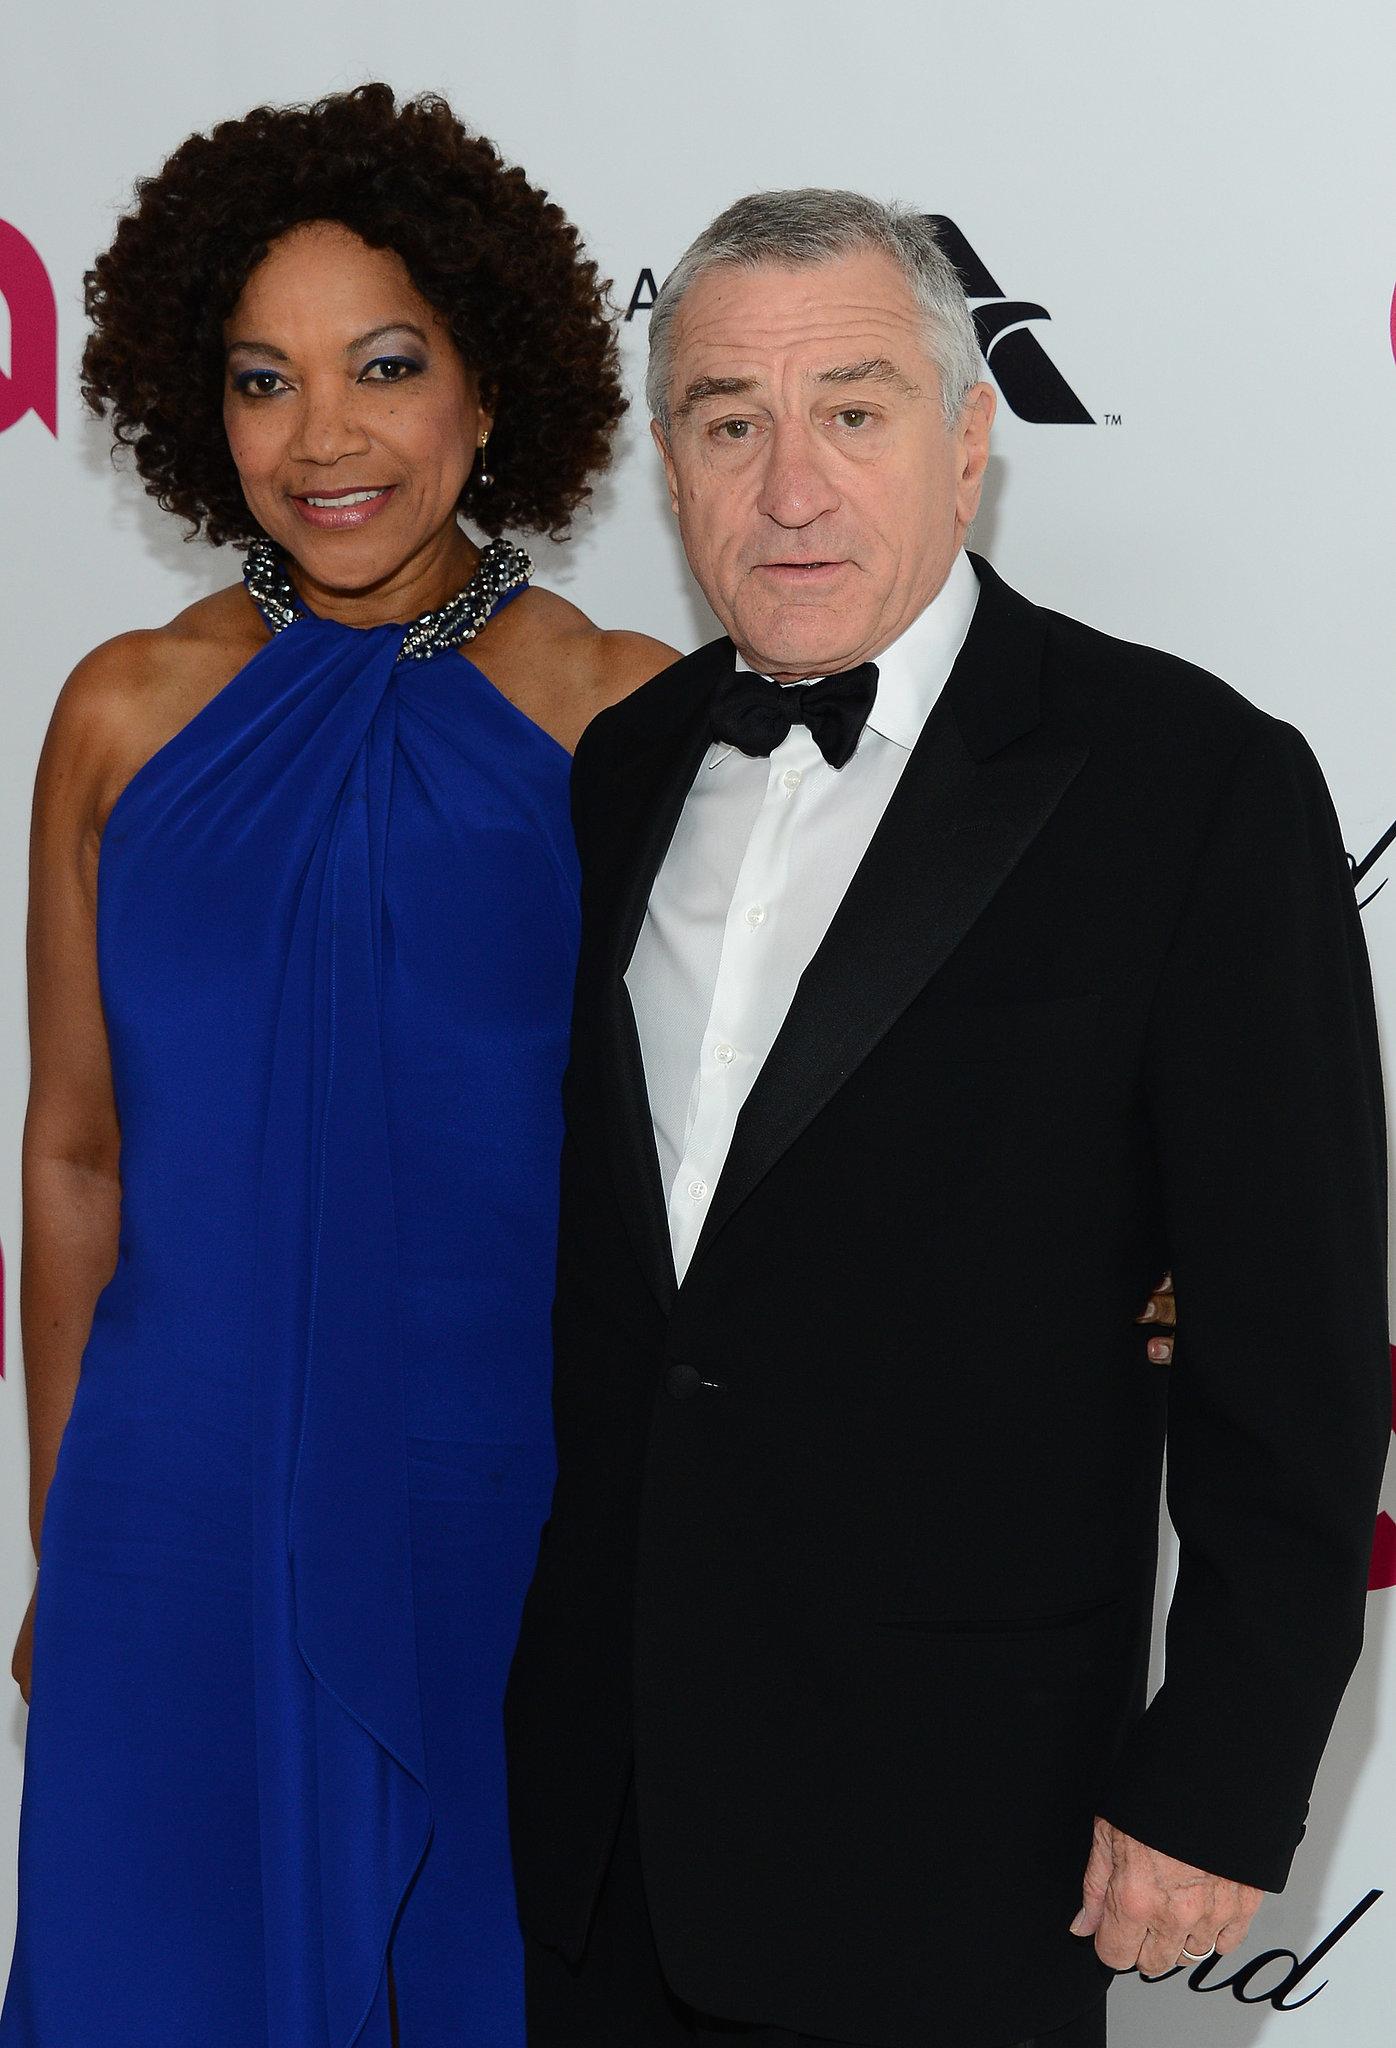 Robert De Niro and his wife, Grace Hightower, smiled.